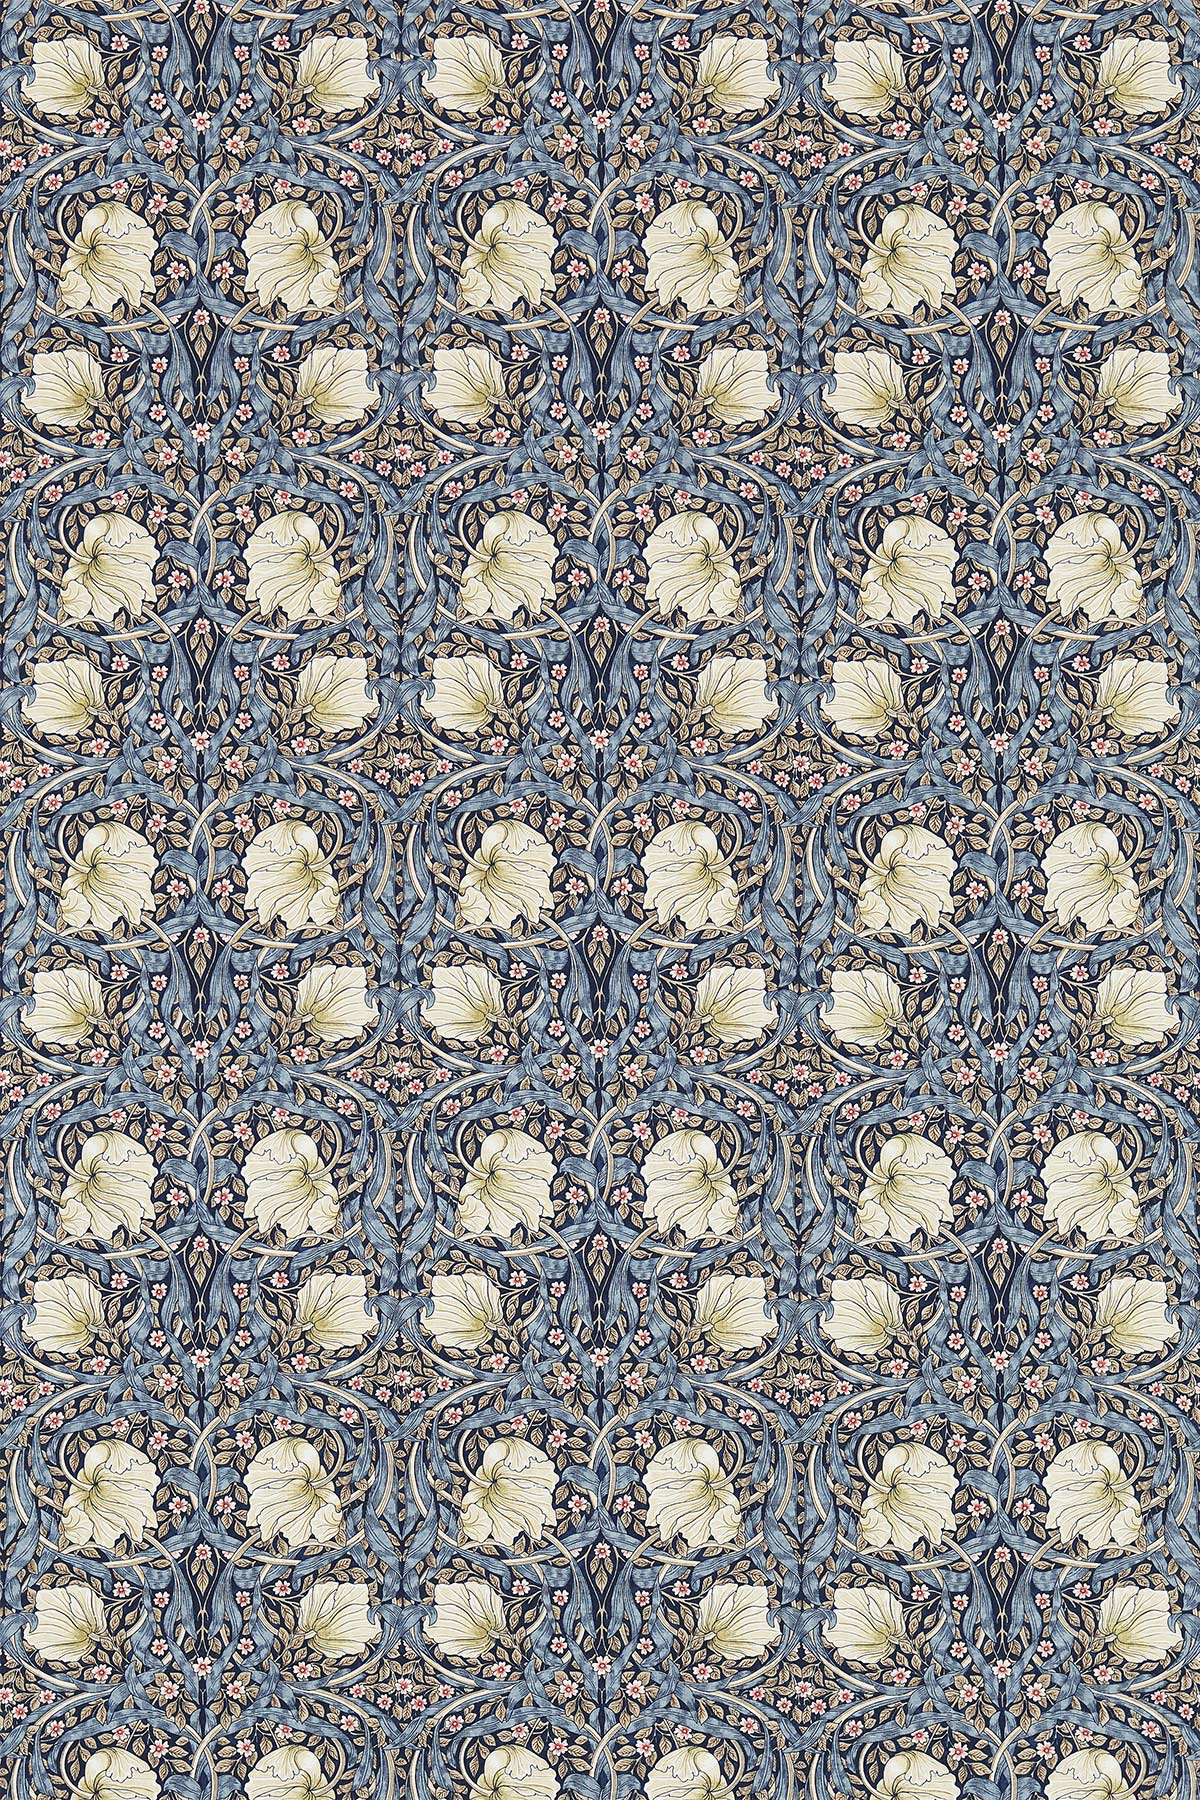 Pimpernel Fabric - Indigo / Hemp - by Morris